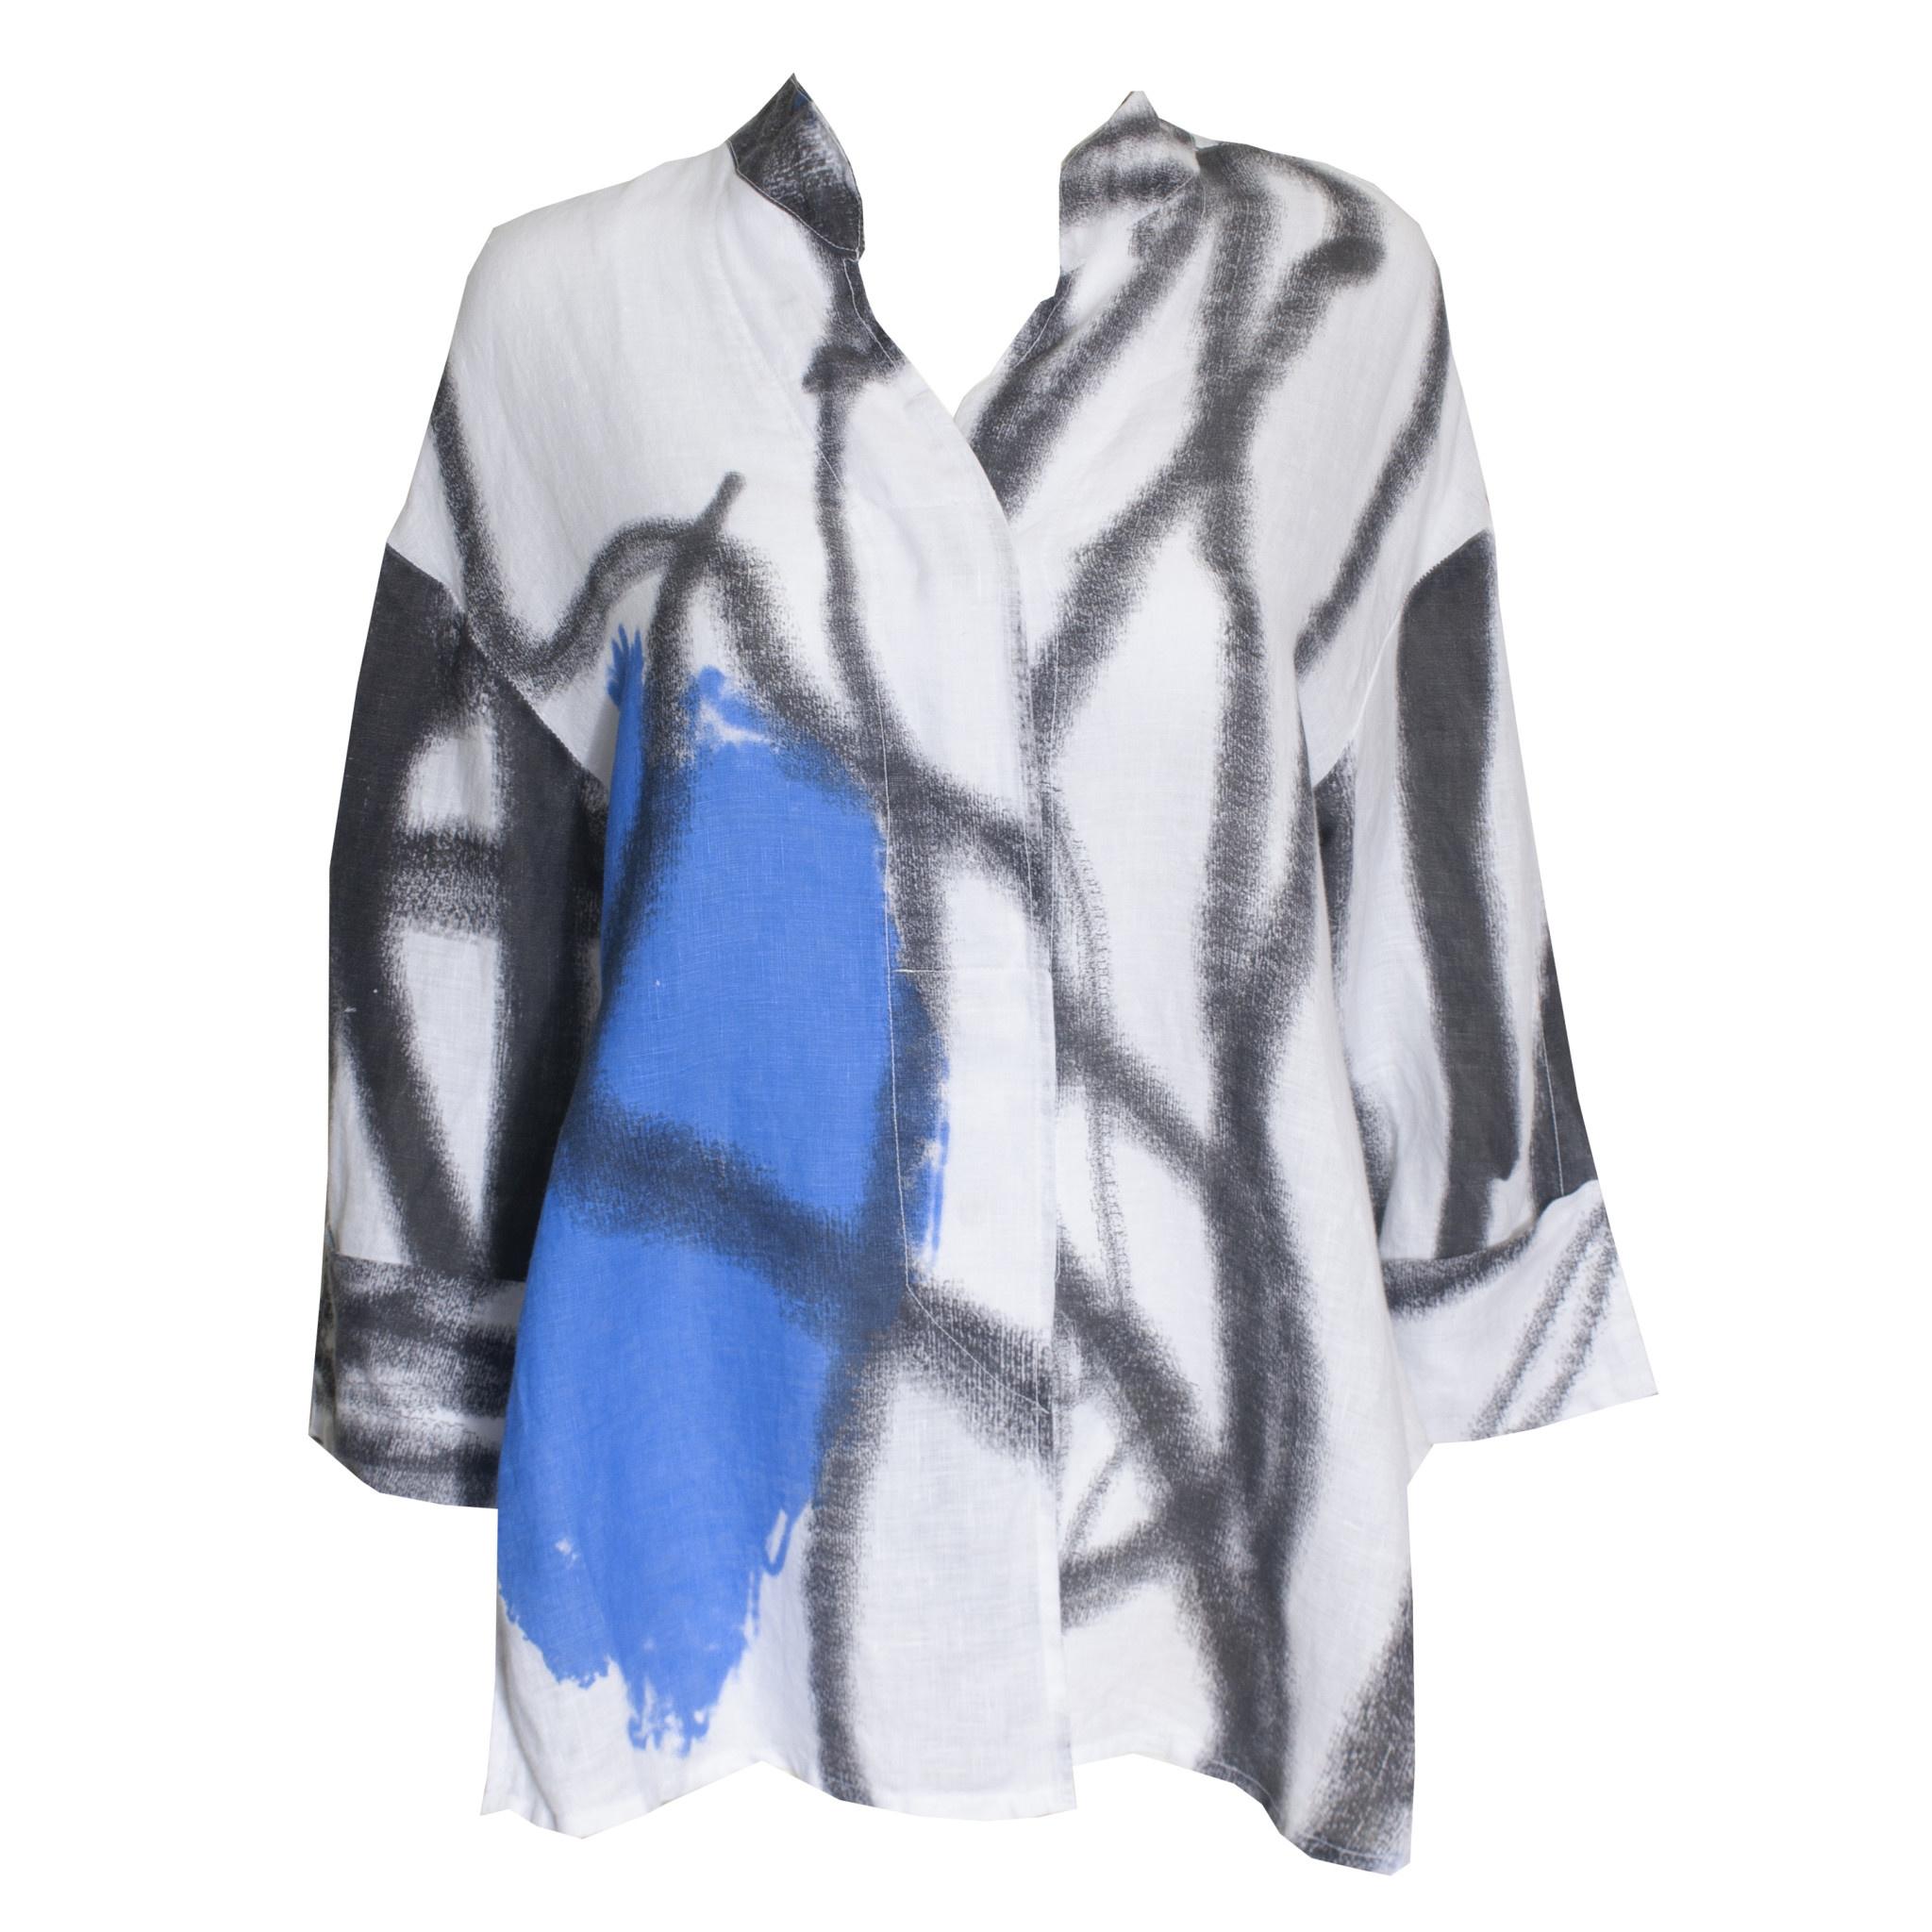 Banana Blue Banana Blue Paint Stroke Shirt